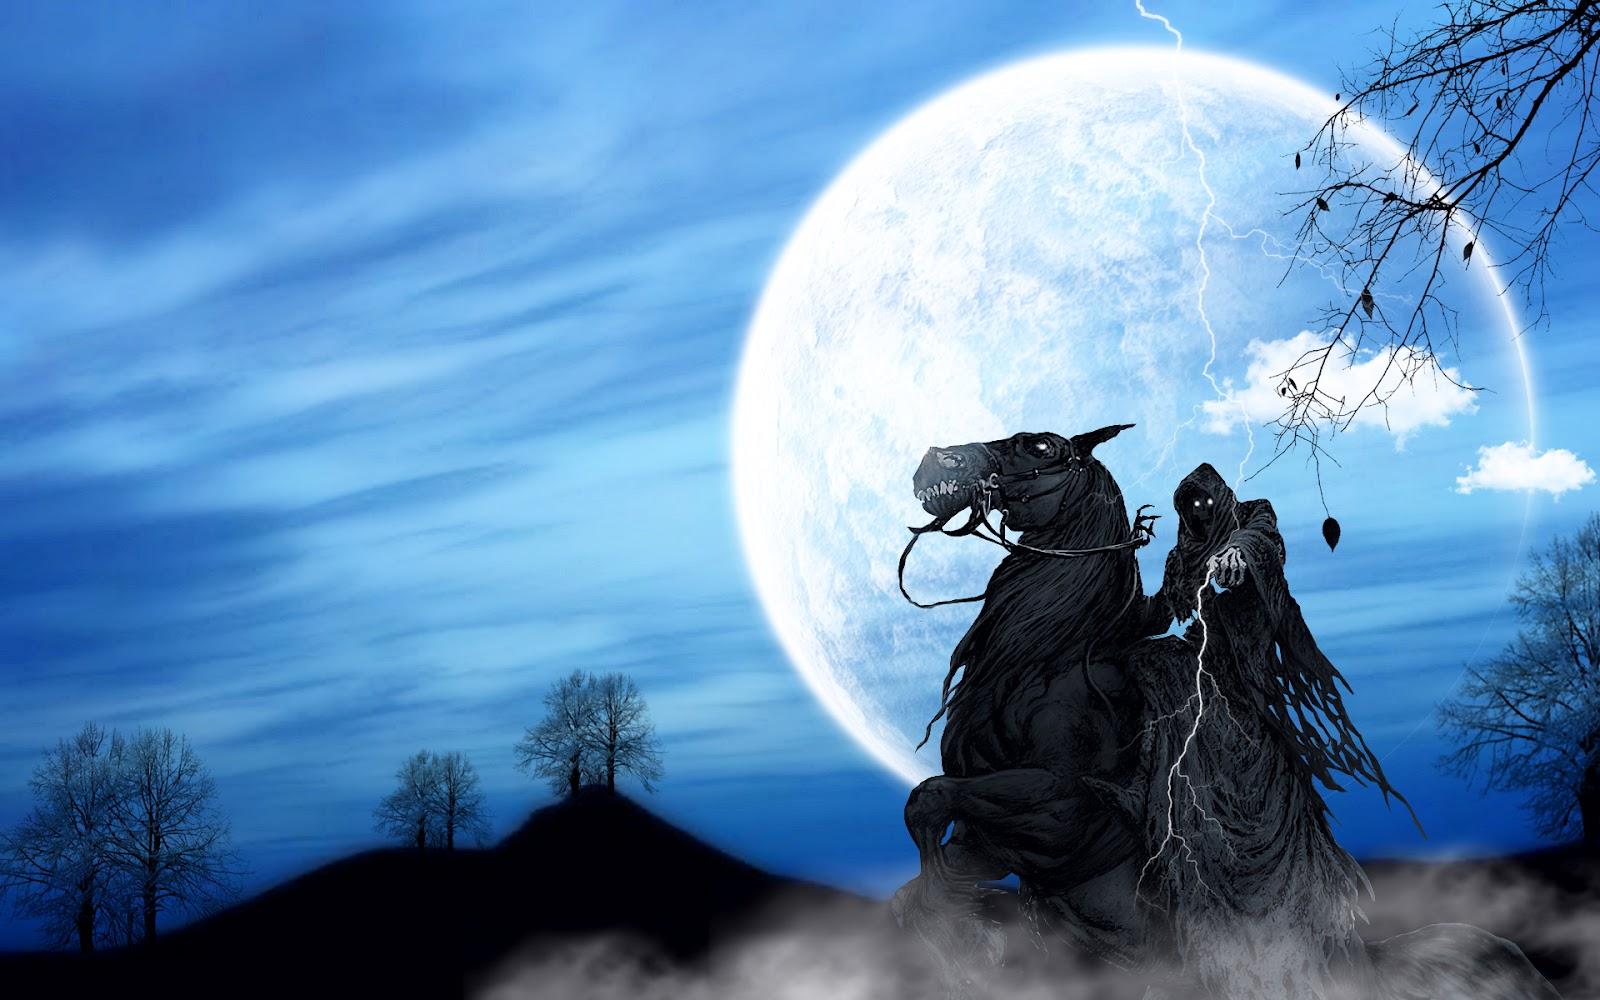 wallpaper horse tonight welshdragon - photo #20